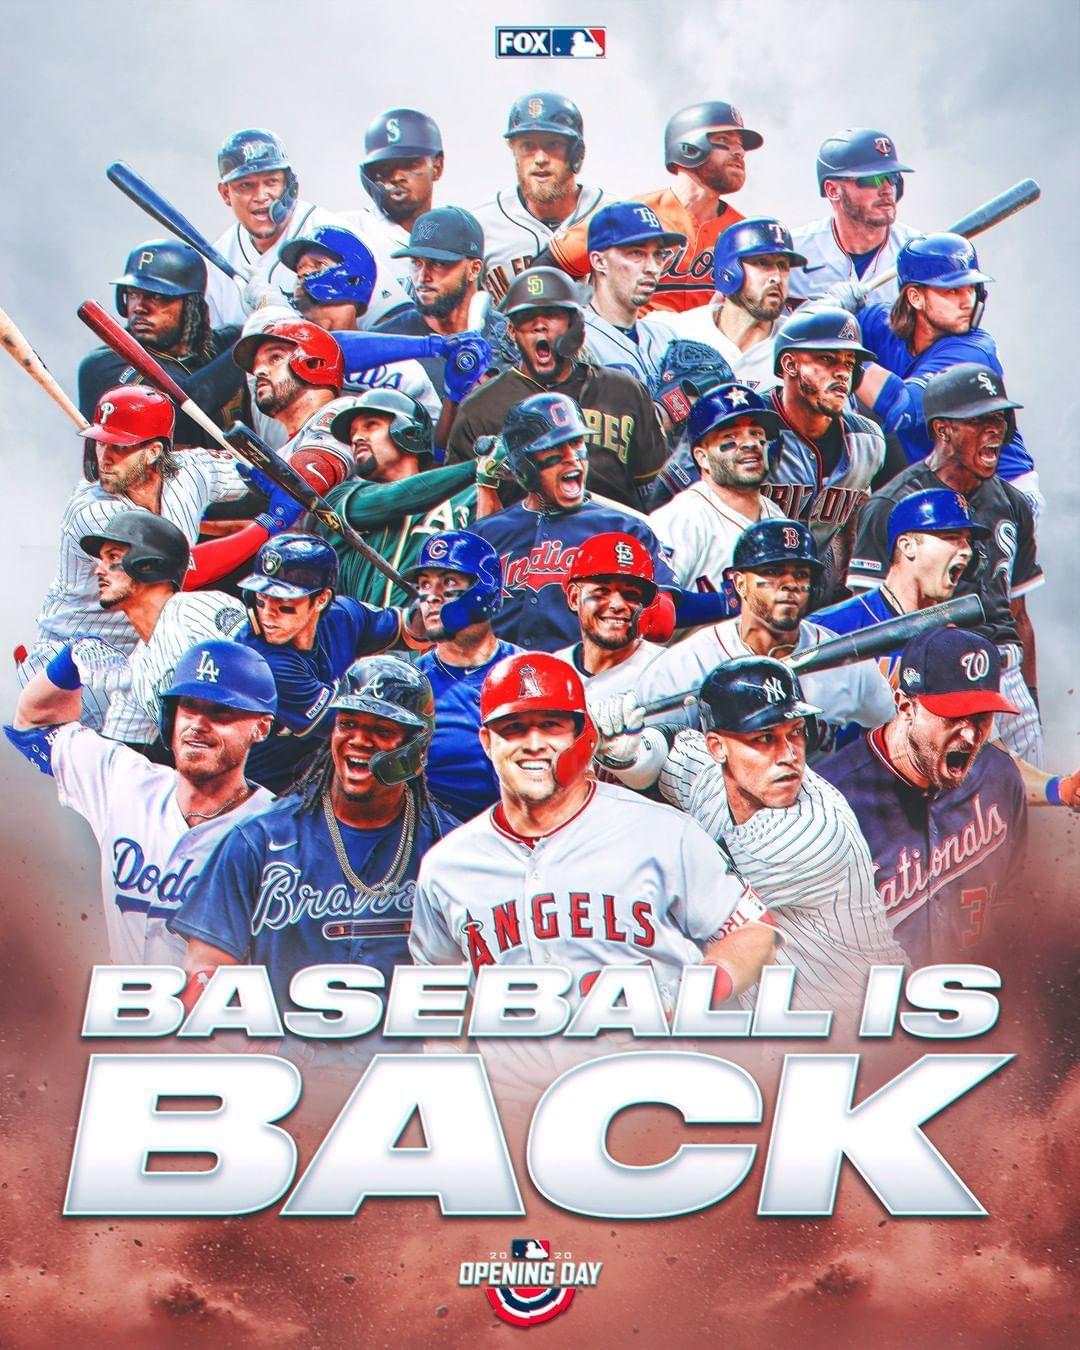 Mlb On Fox On Instagram It S Finally Here Happy Openingday In 2020 Baseball Season Major League Baseball Mlb